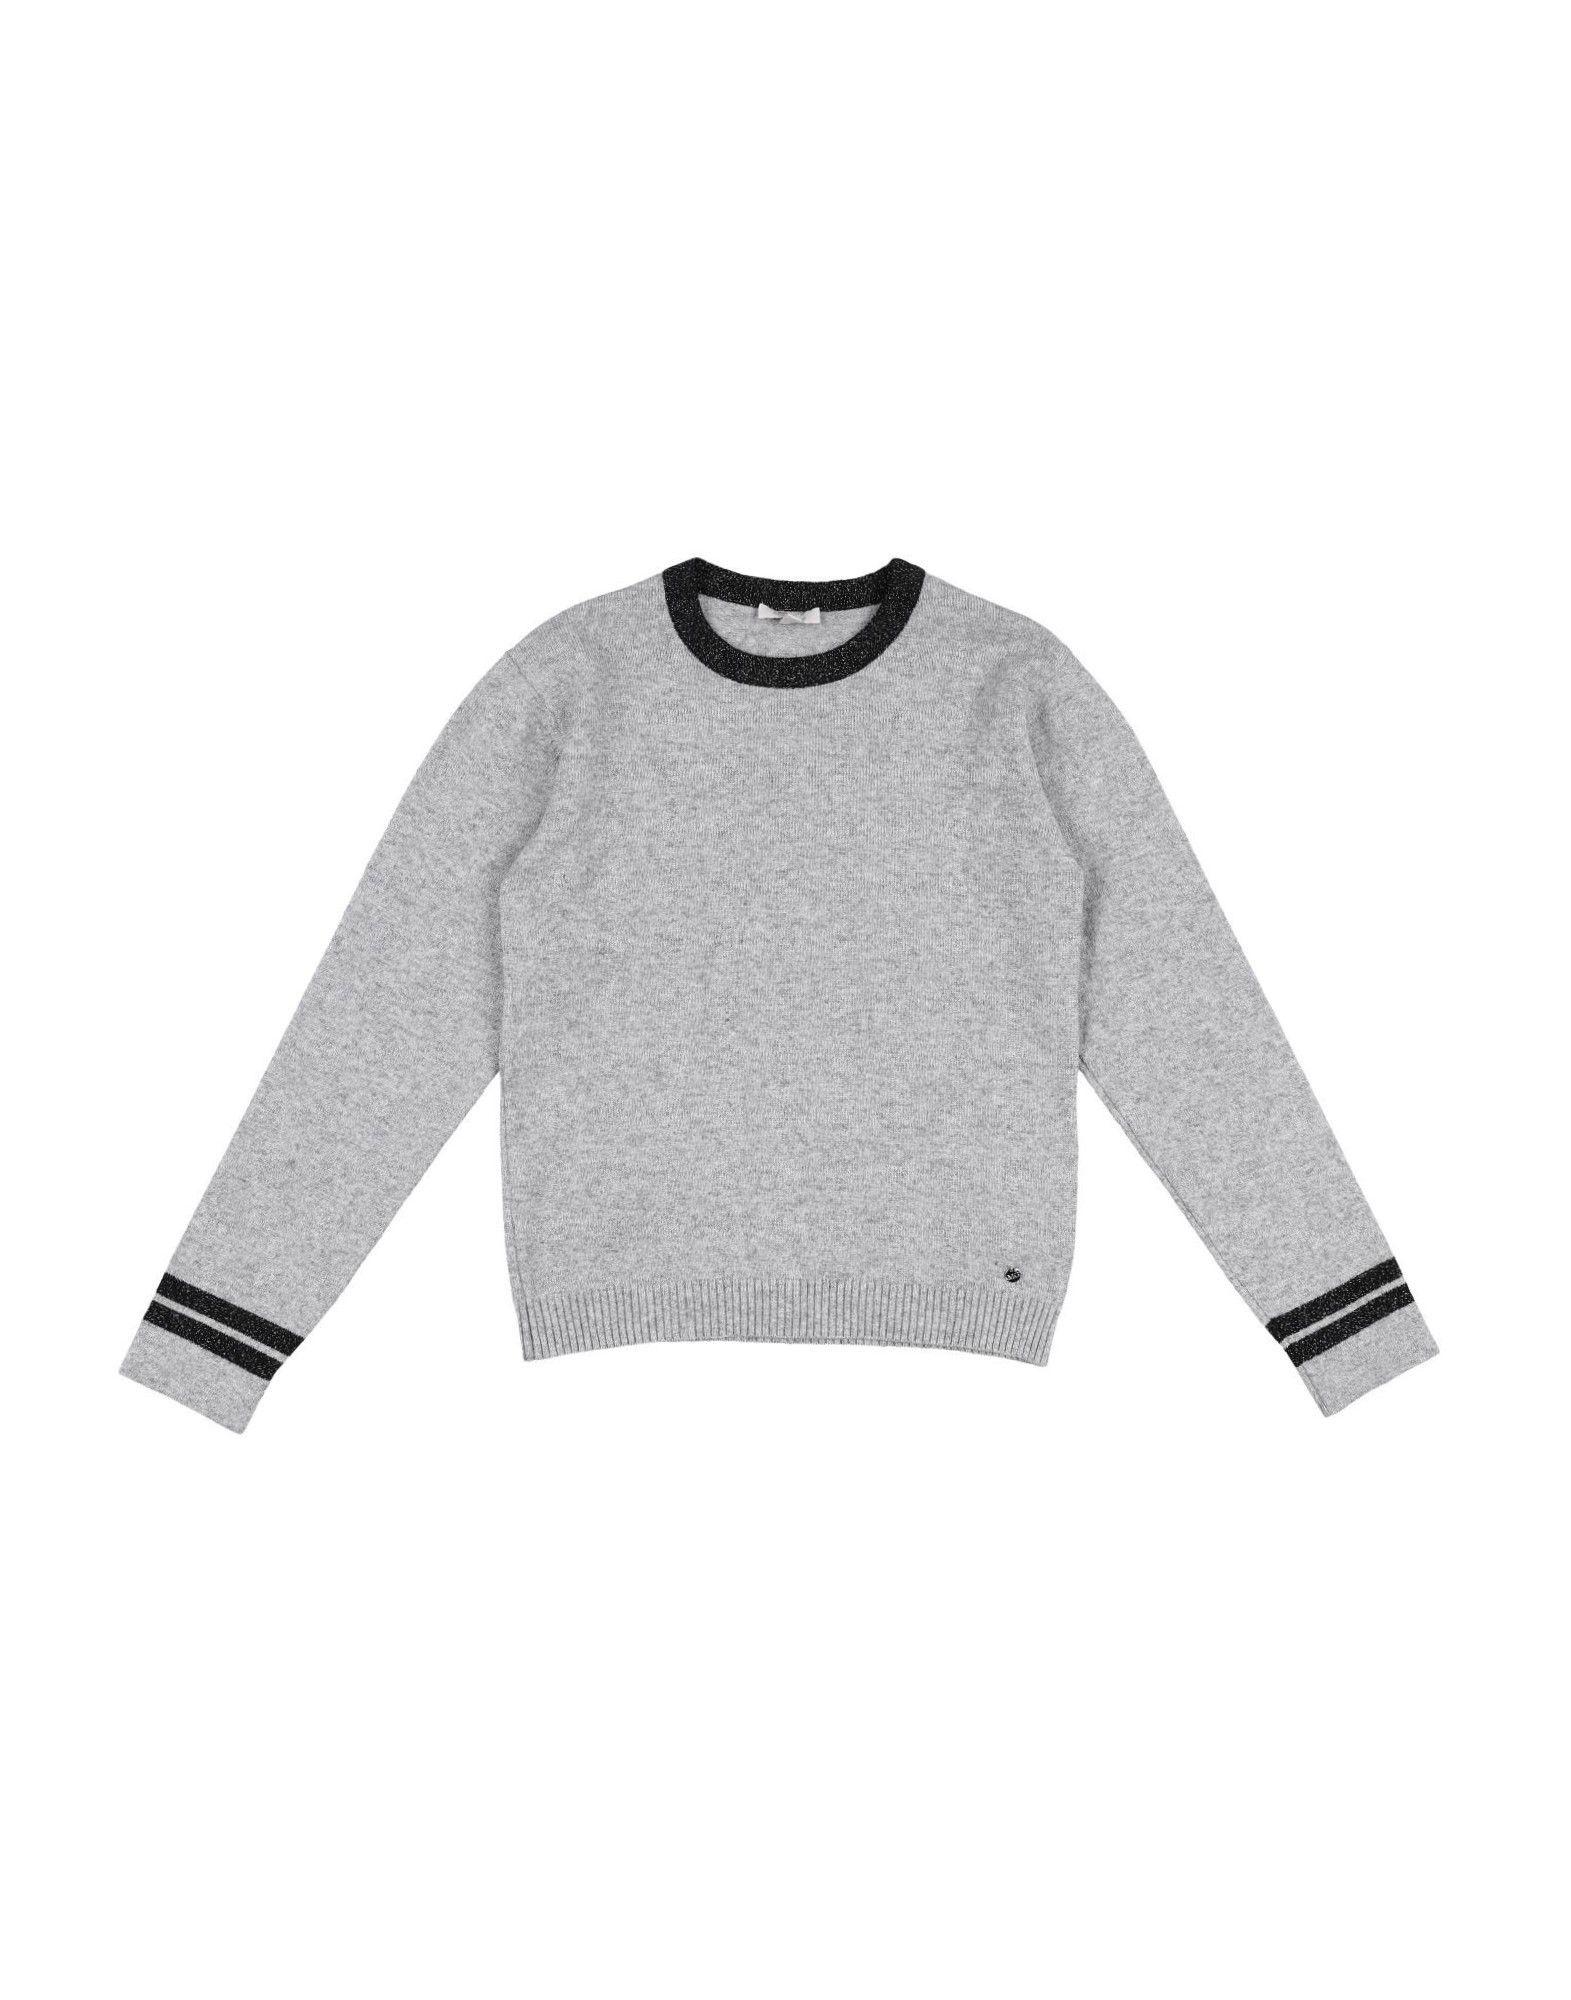 MISS GRANT Sweaters - Item 39951653